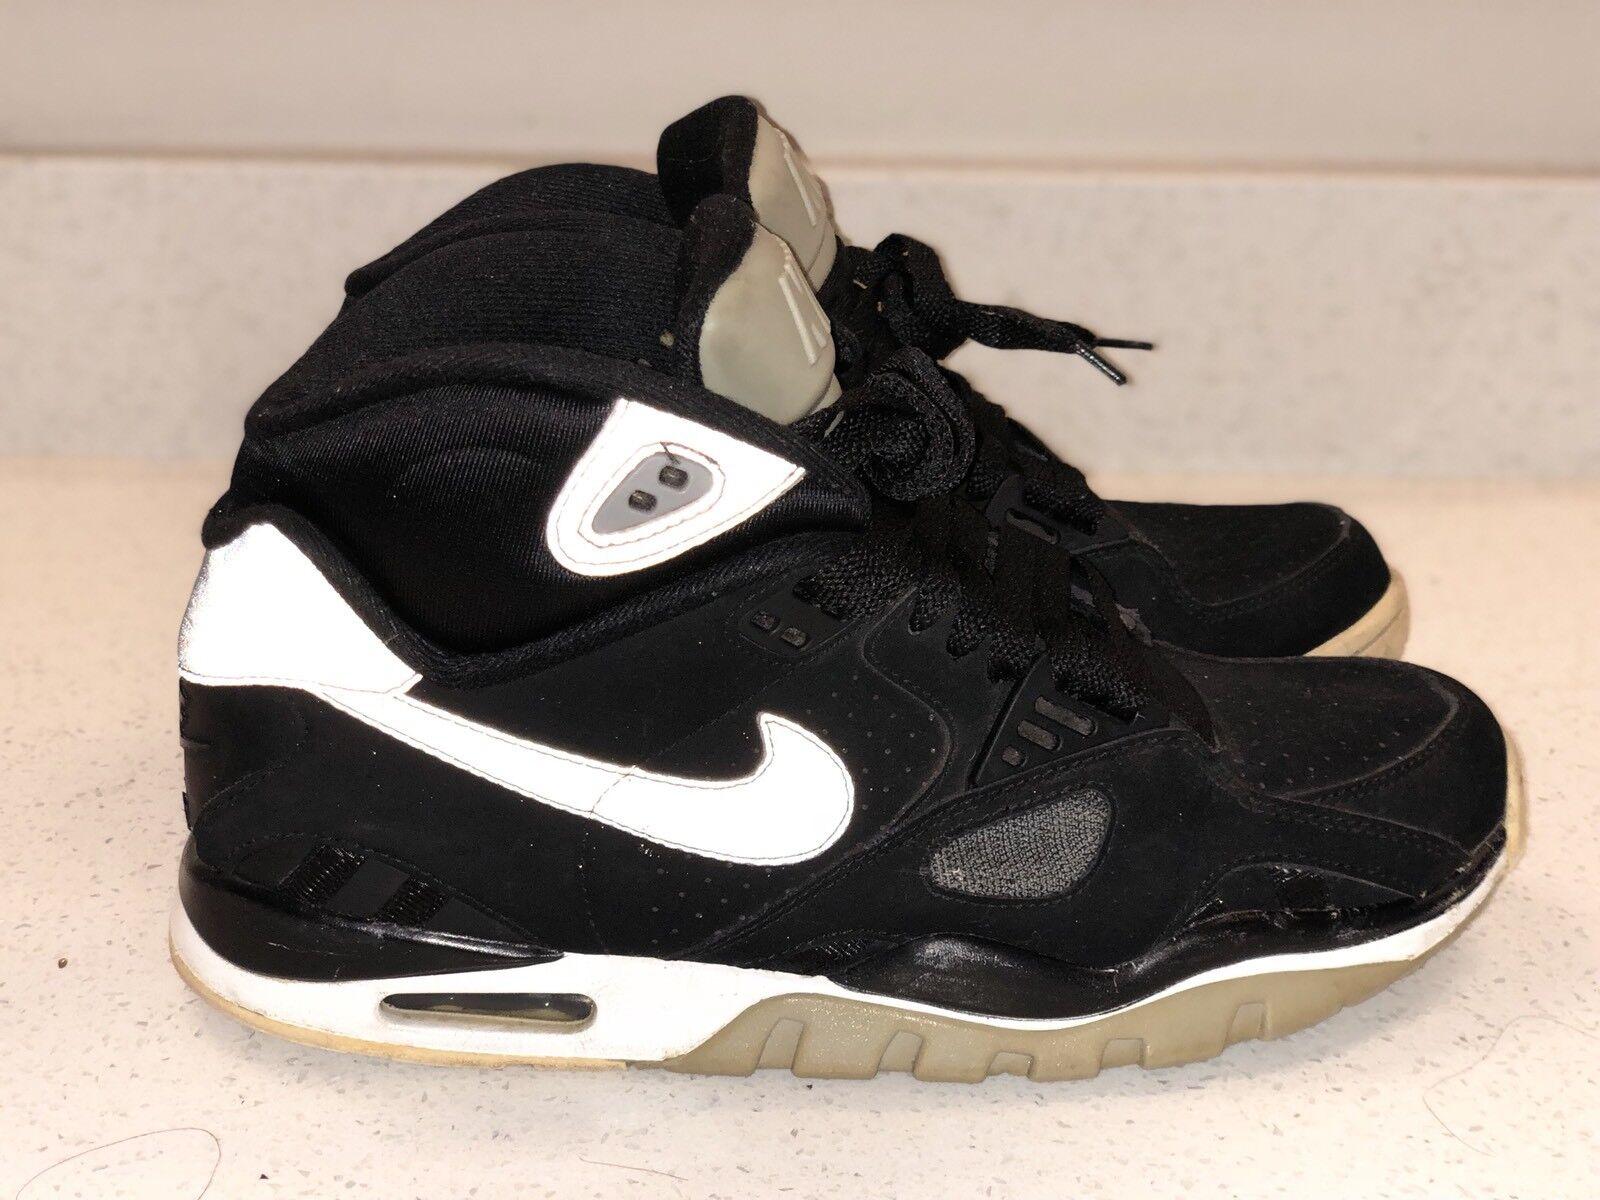 Nike Air Trainer SC II sz 8.5 Bo Jackson Raiders 443575-011 Rare Vintage!